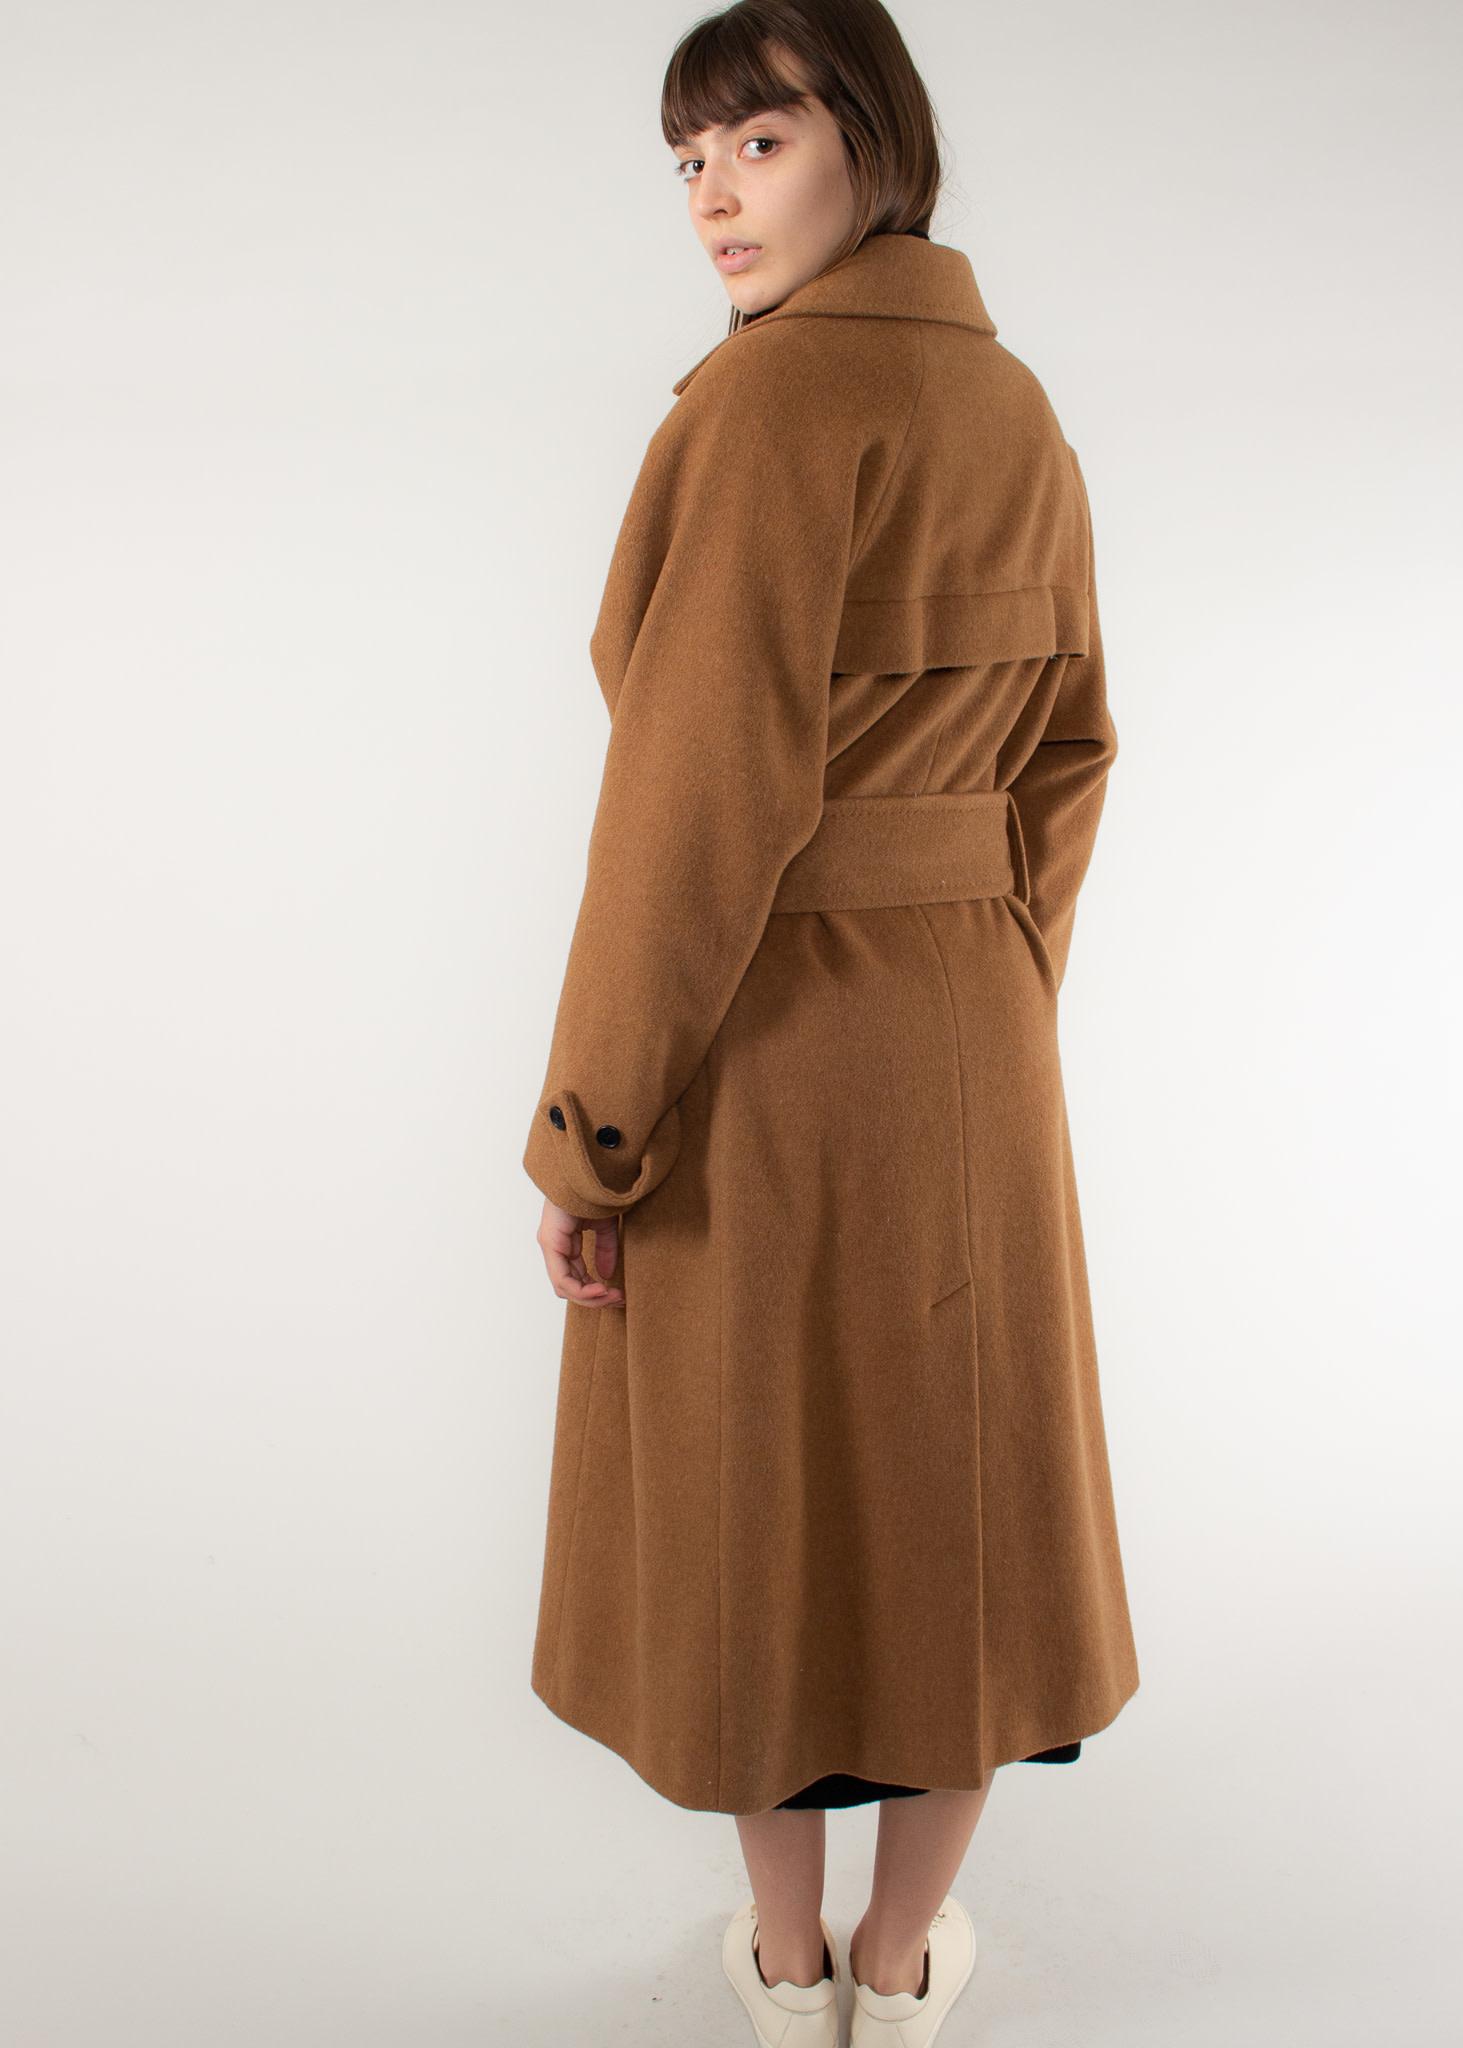 IN WEAR Zelie coat